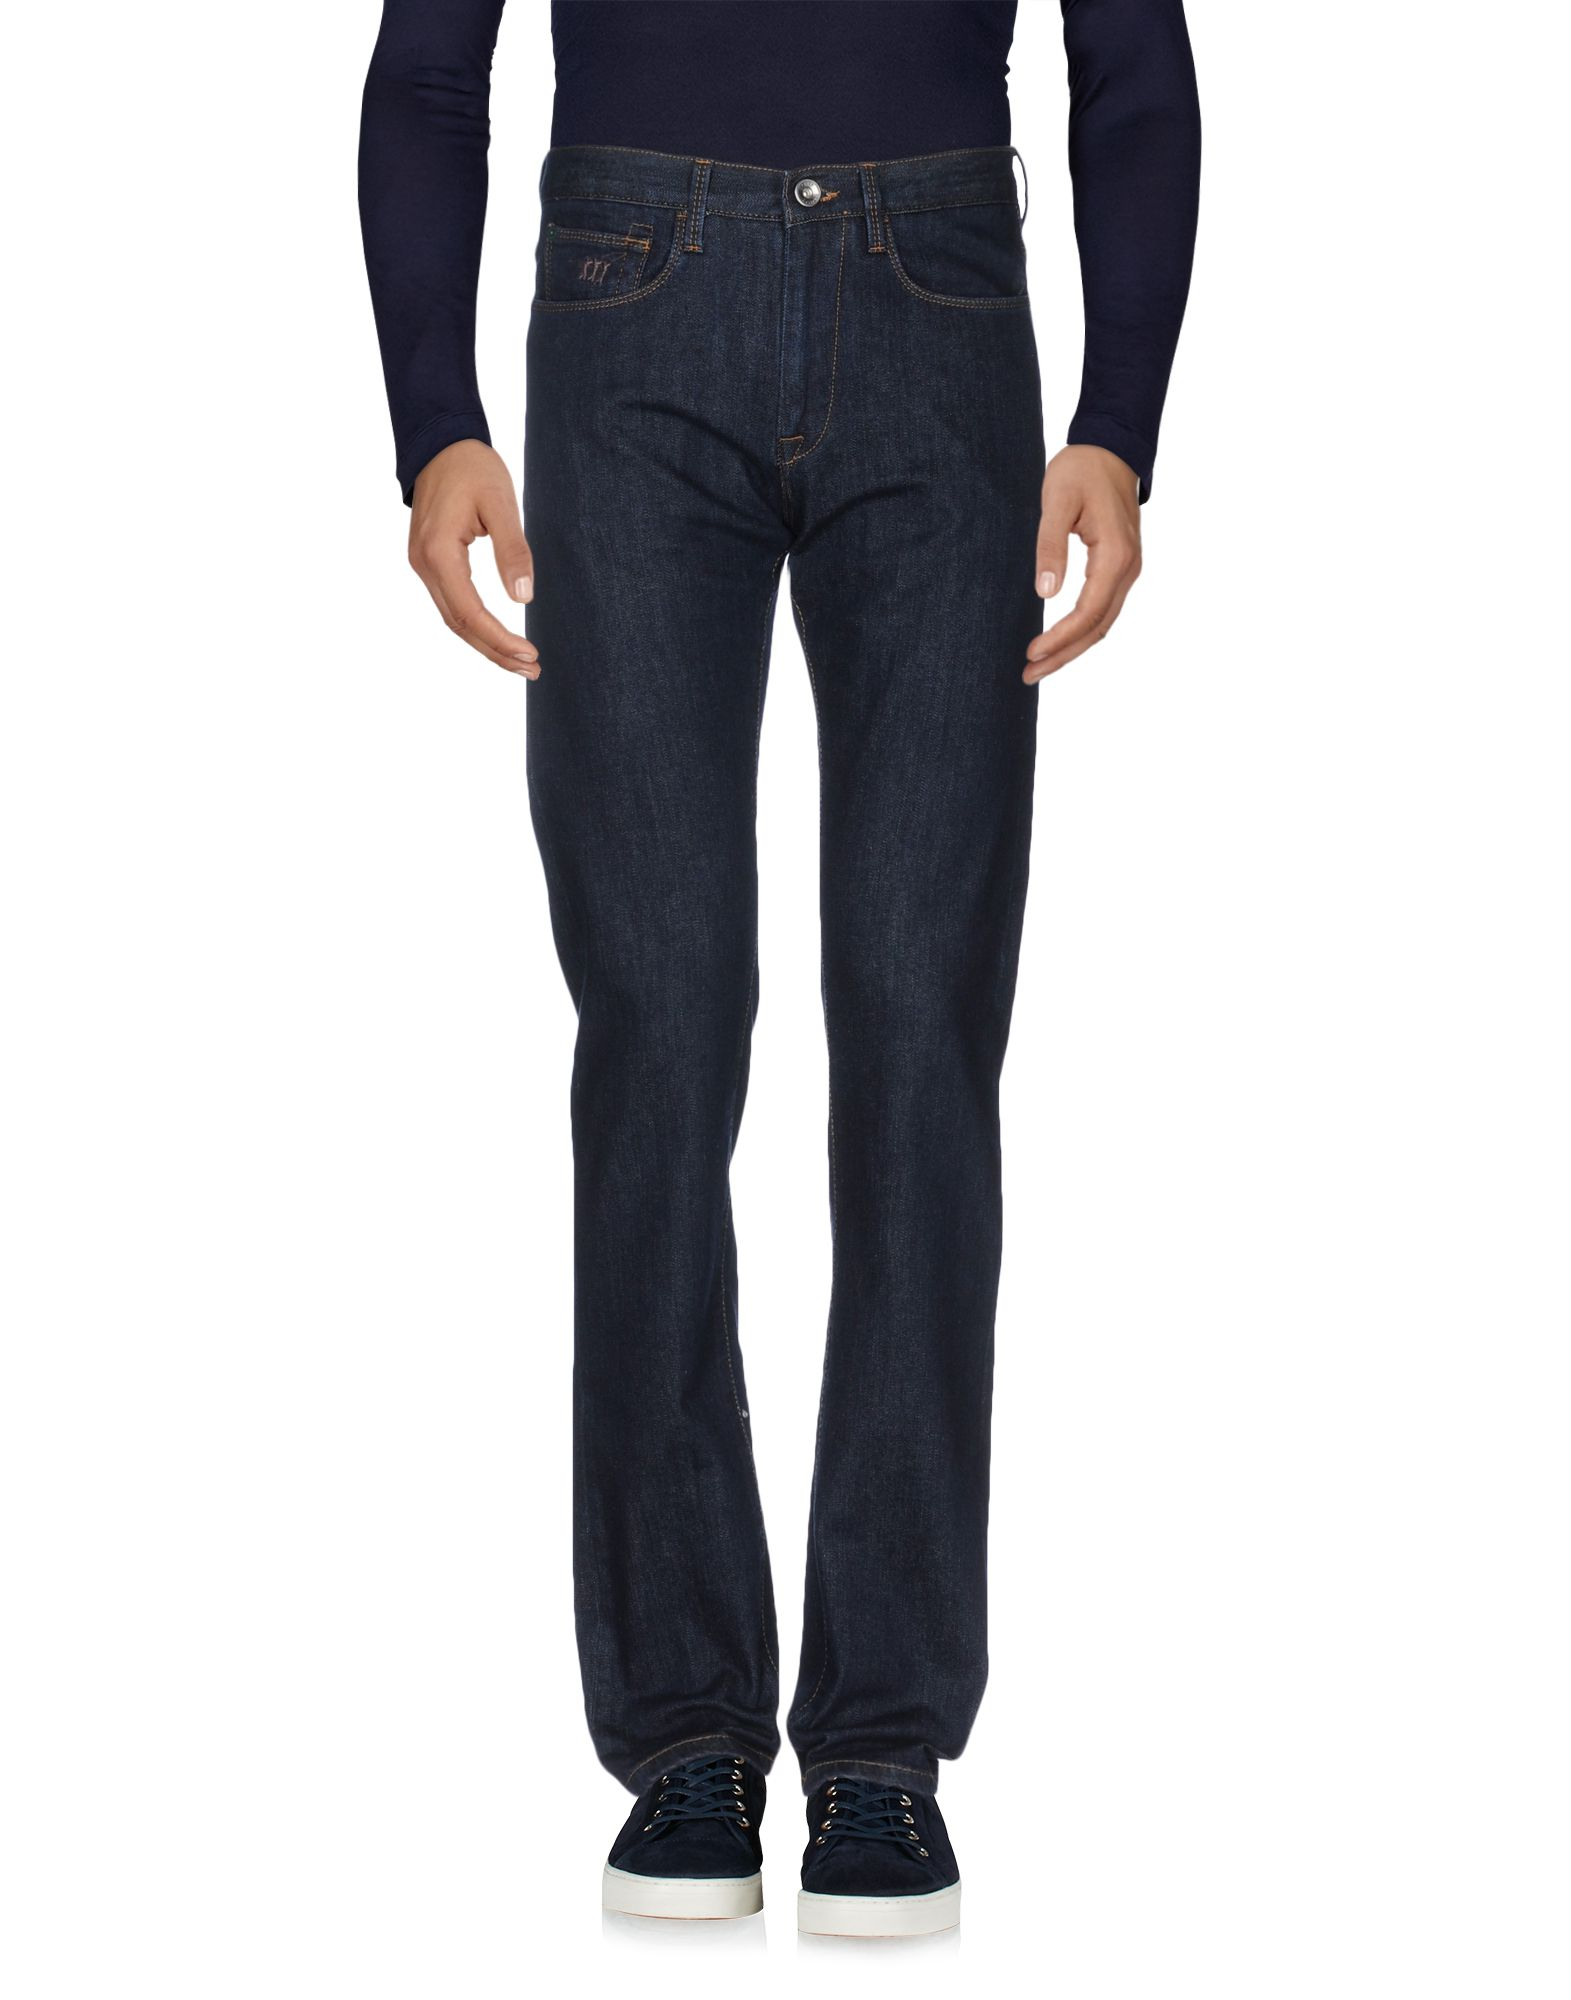 Pantaloni - Jeans Henry Cotton's Uomo - Pantaloni 42511800LT 910ba2